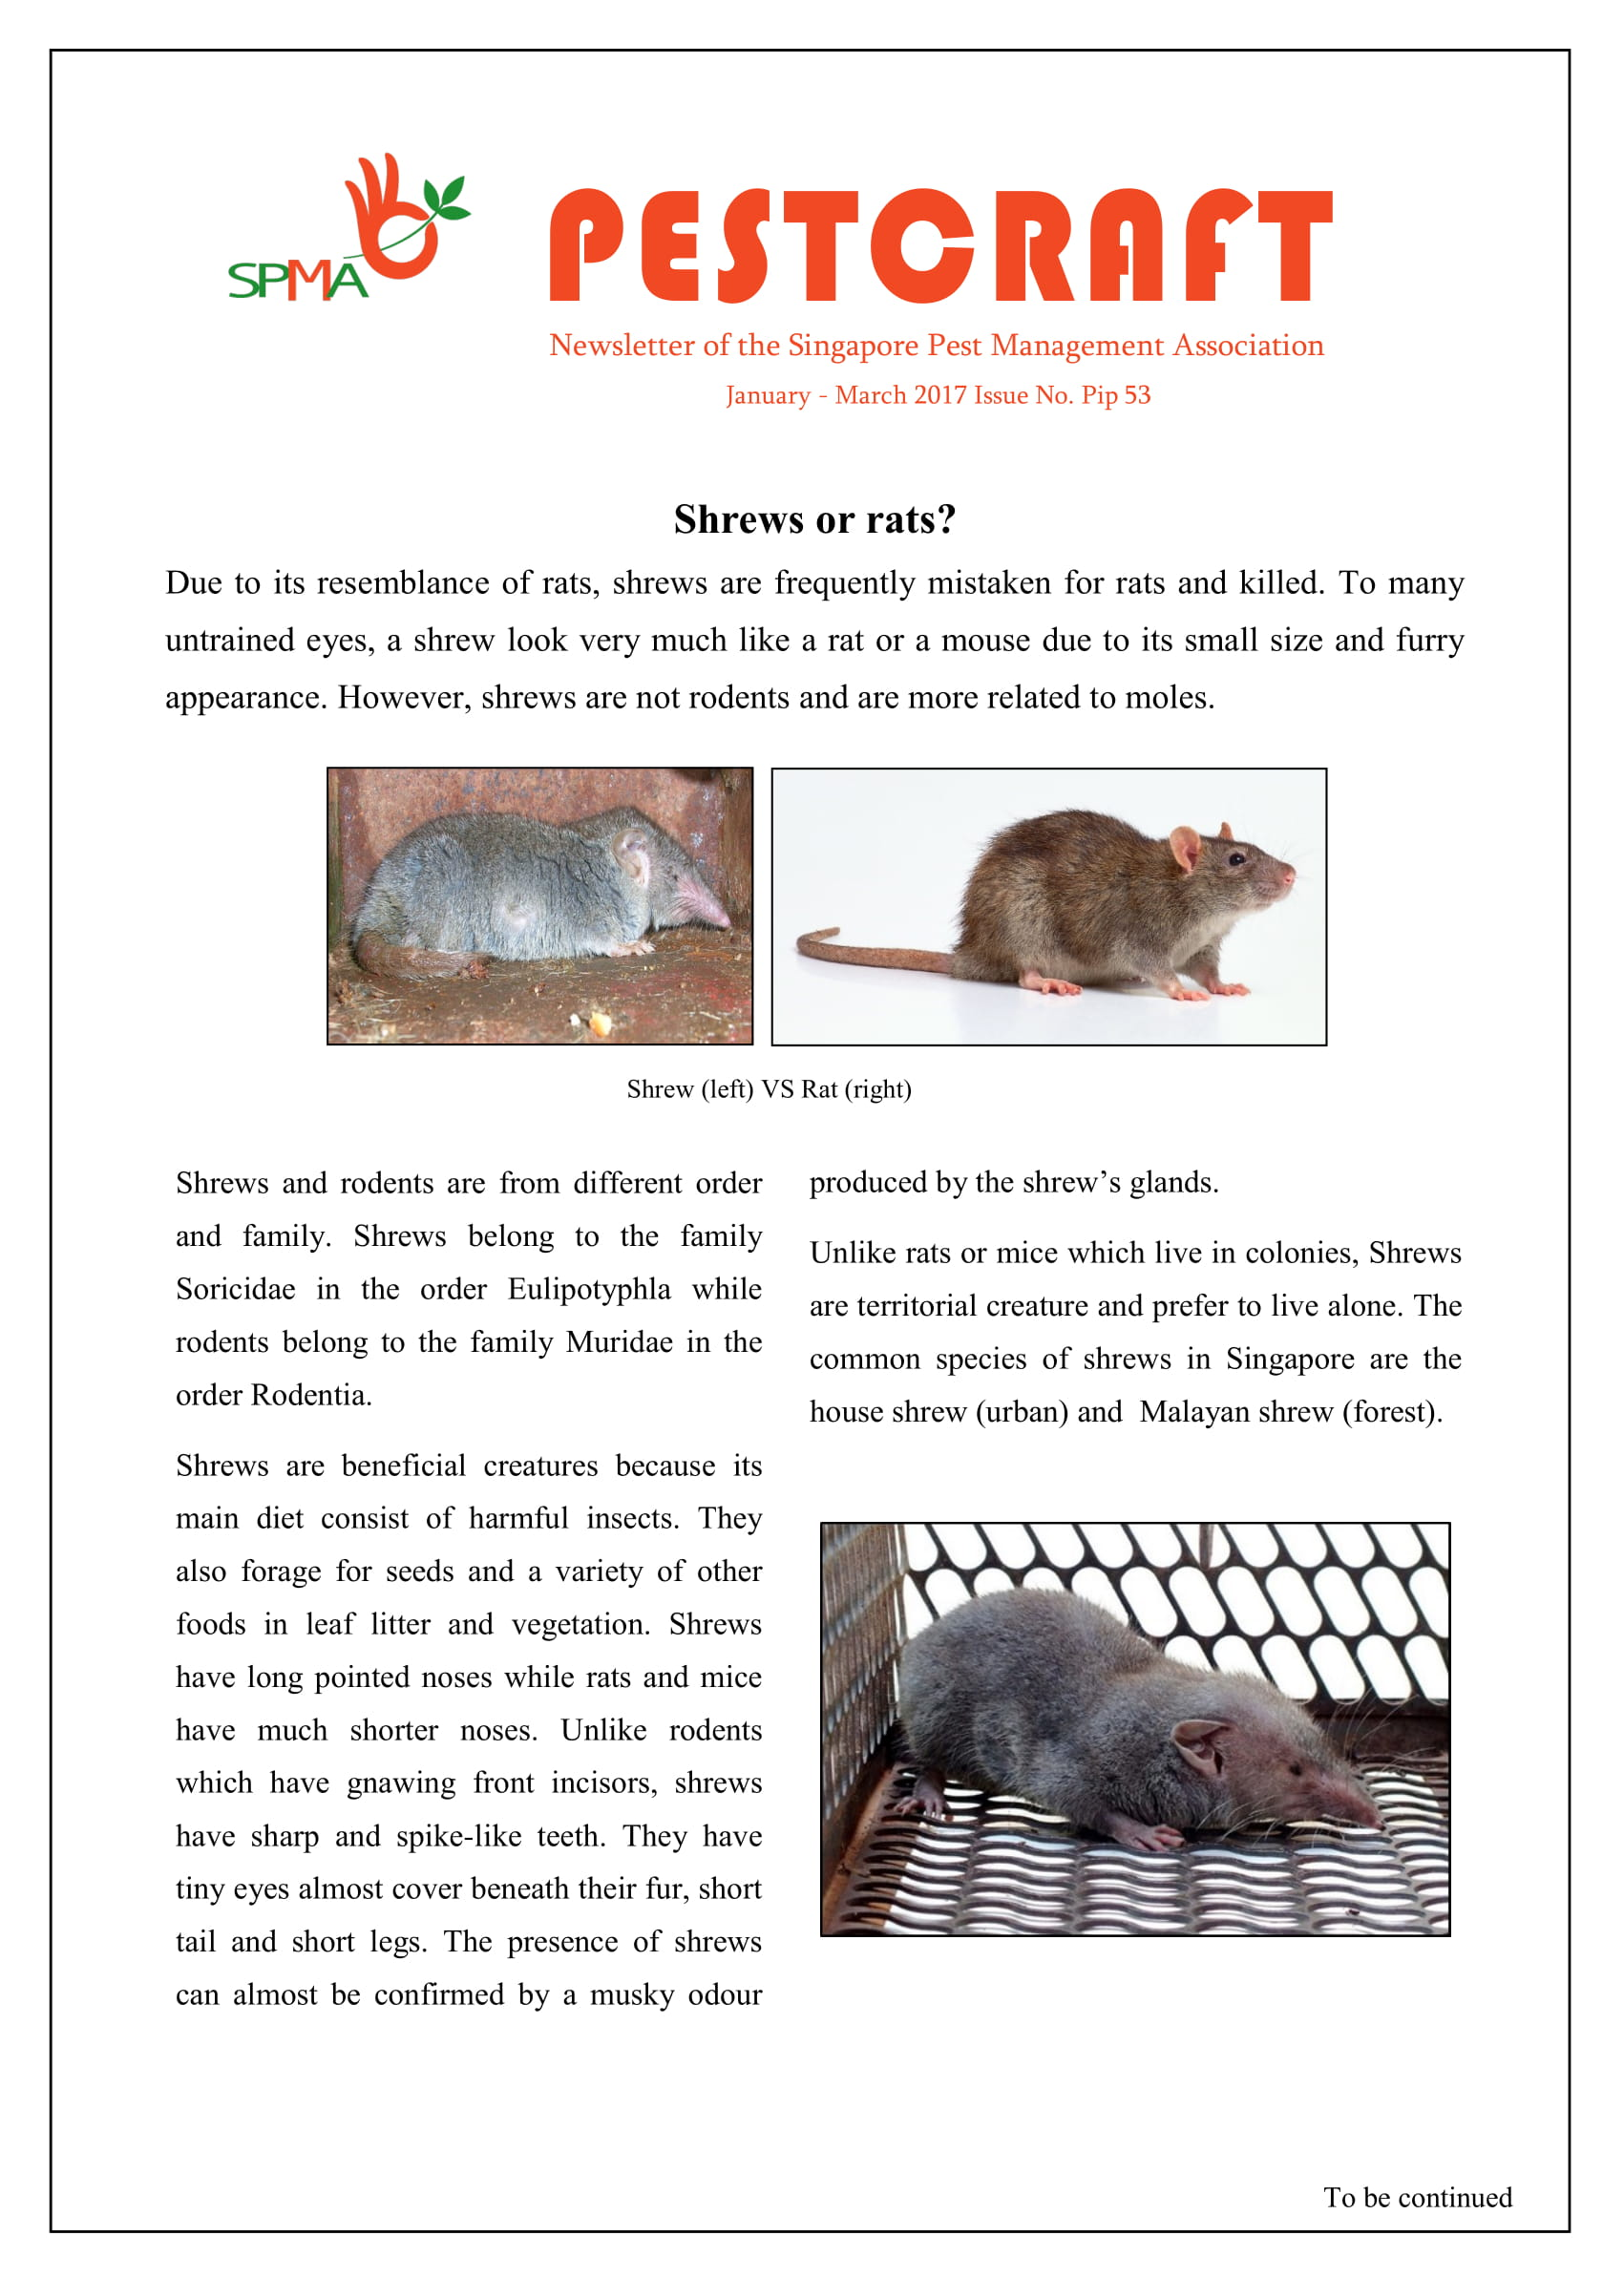 SPMA-PestCraft(Jan-Mar2017 issue)-1.jpg